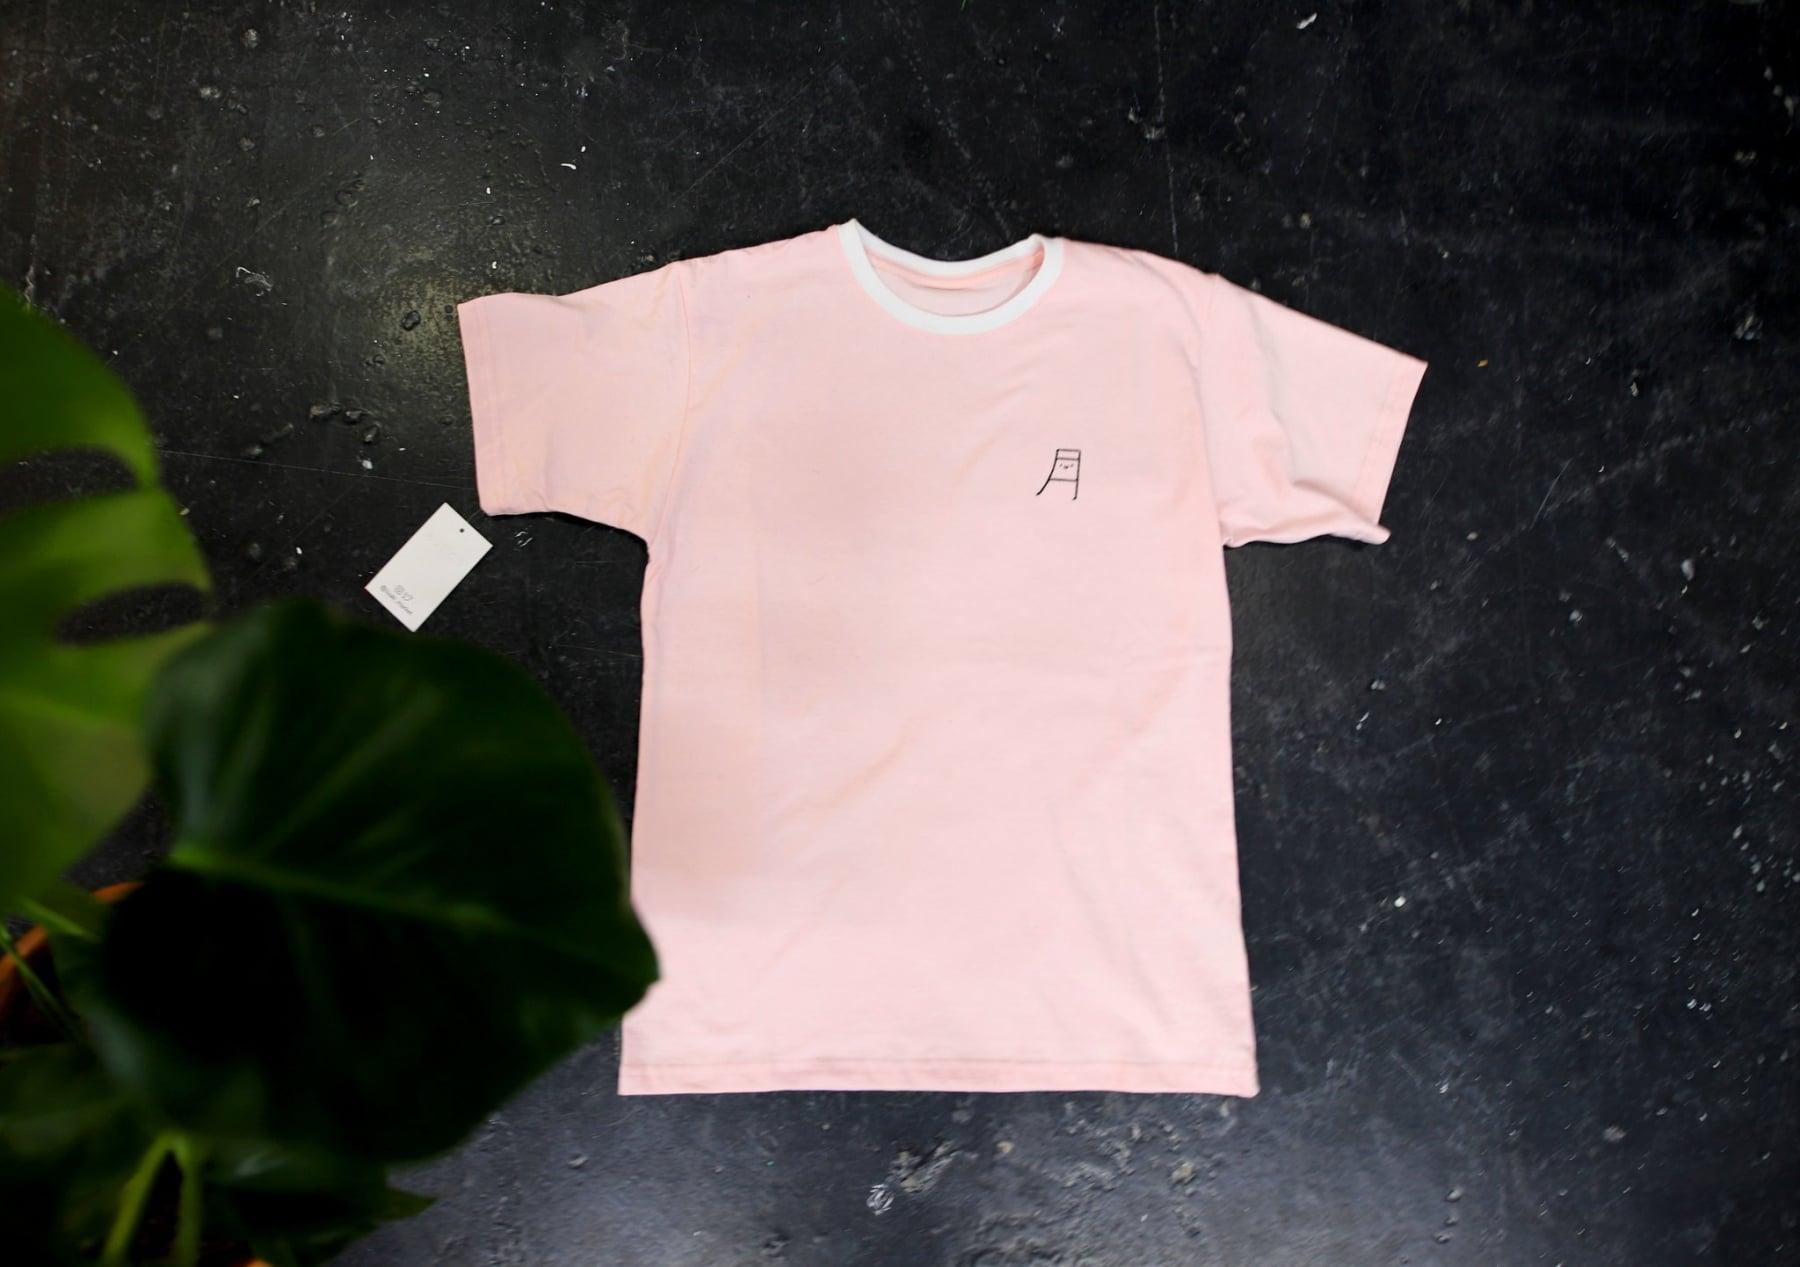 tsuki t shirt collection